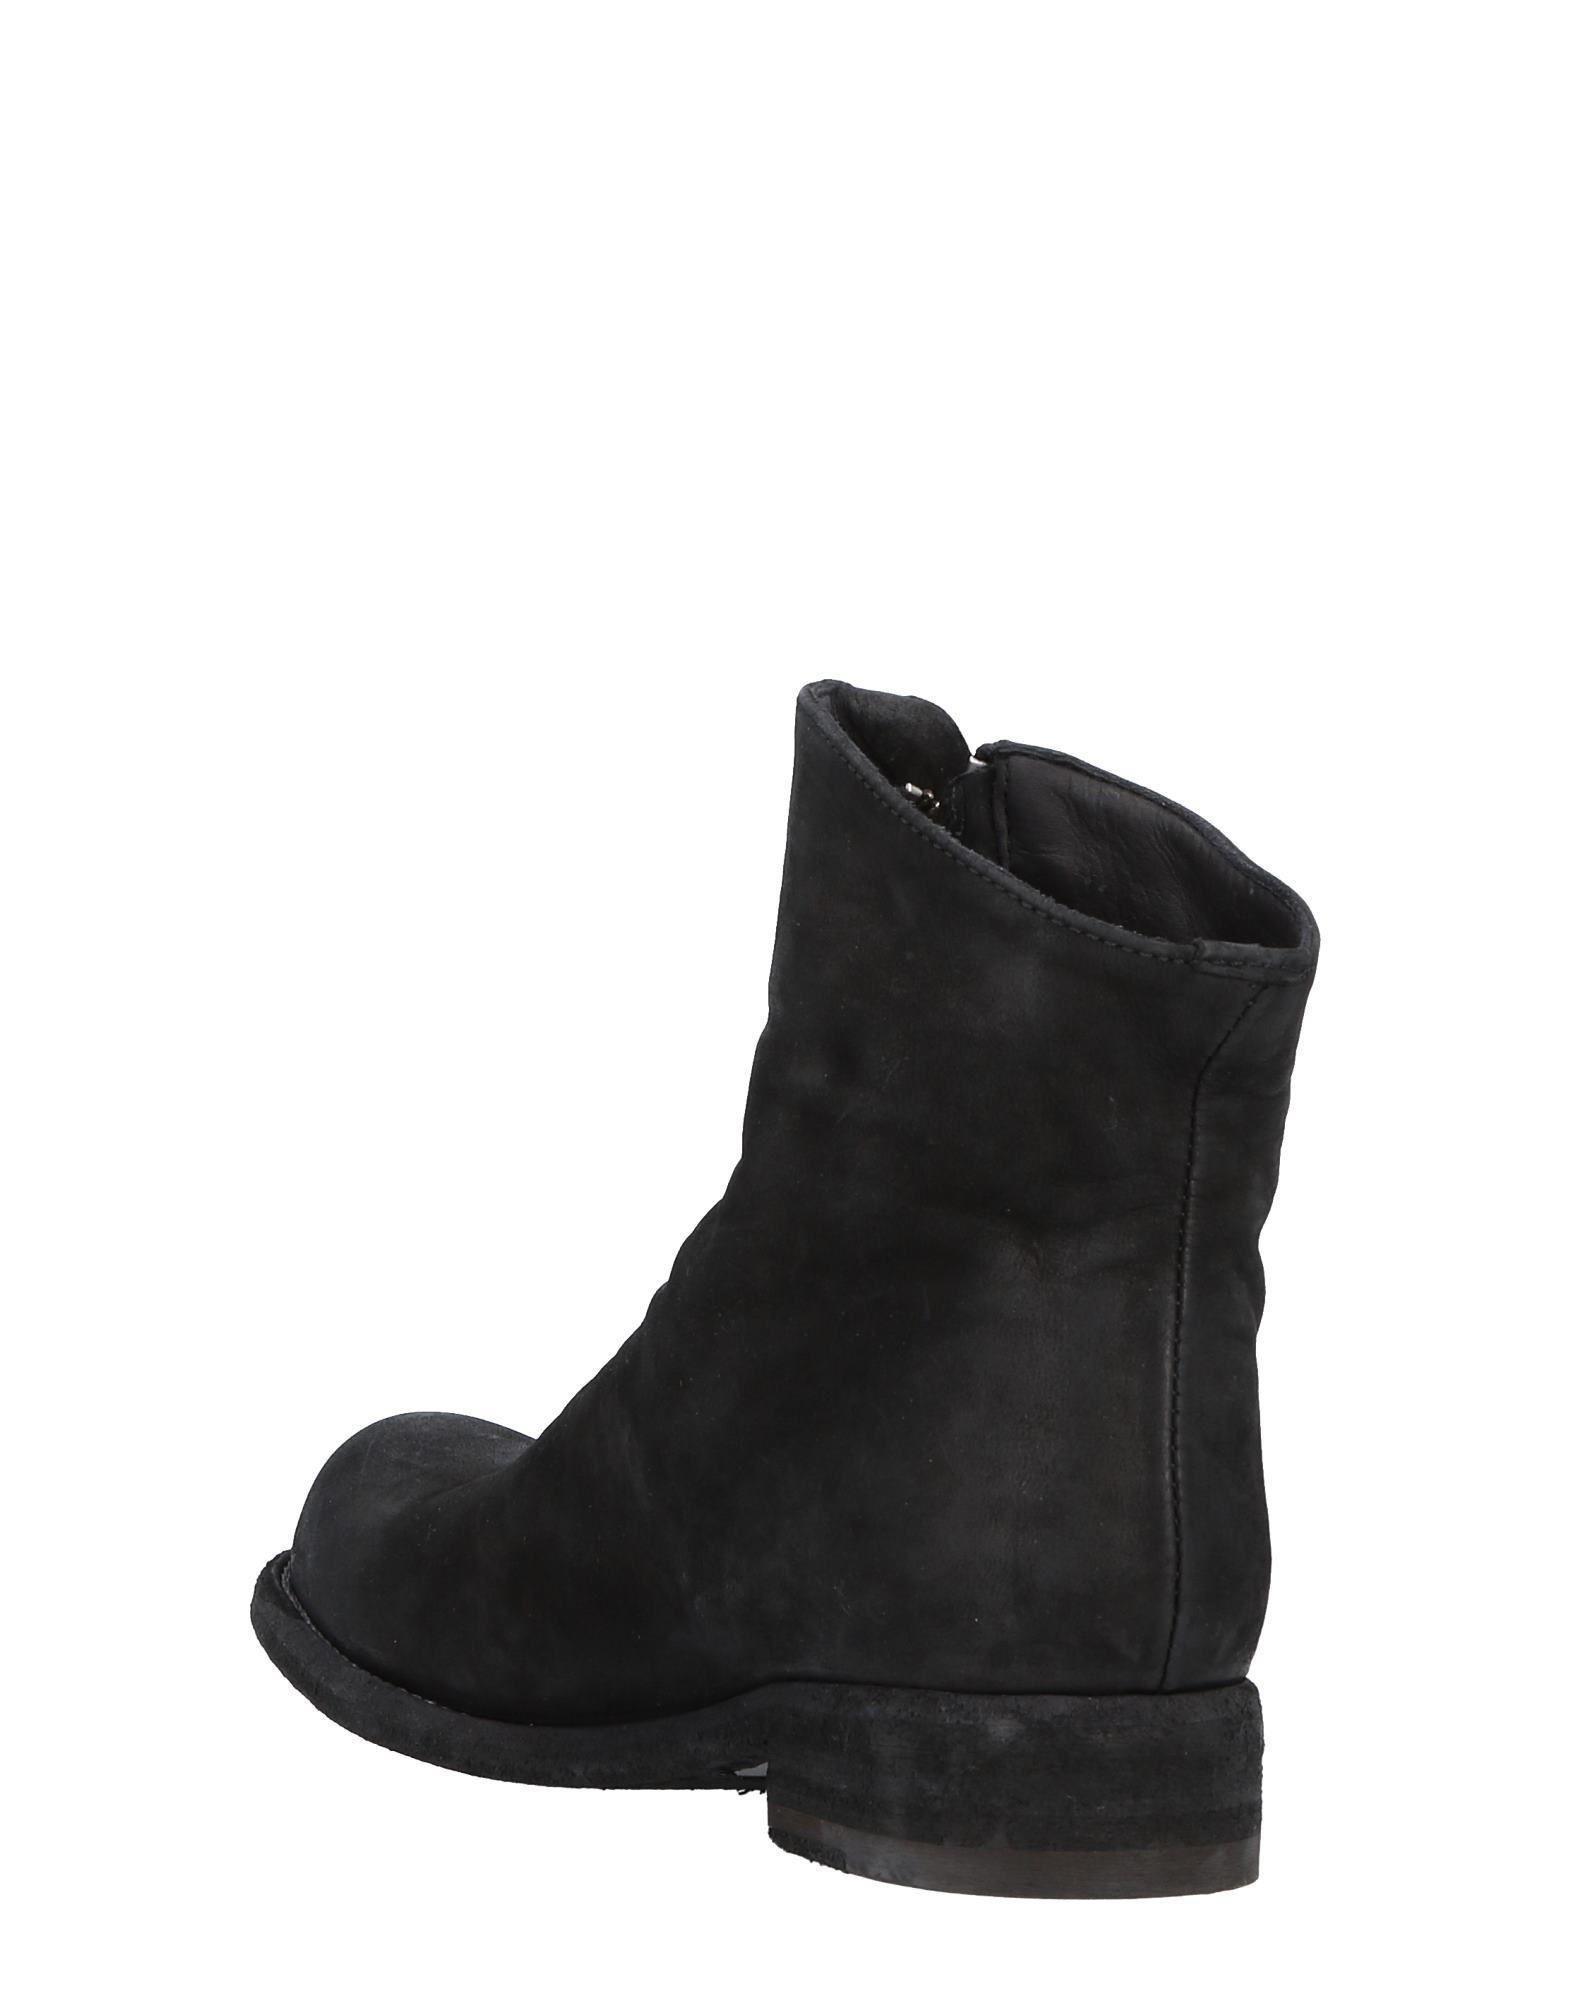 Officine Creative Creative Creative Italia Stiefelette Damen  11517105KX Neue Schuhe dd5ff1